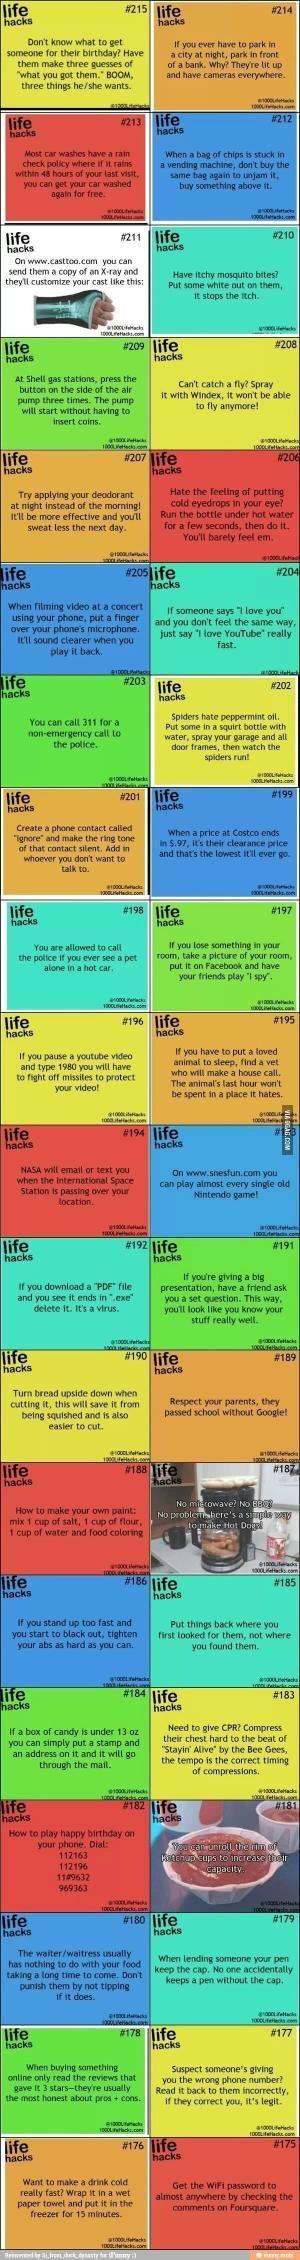 Life hacks by J.H.